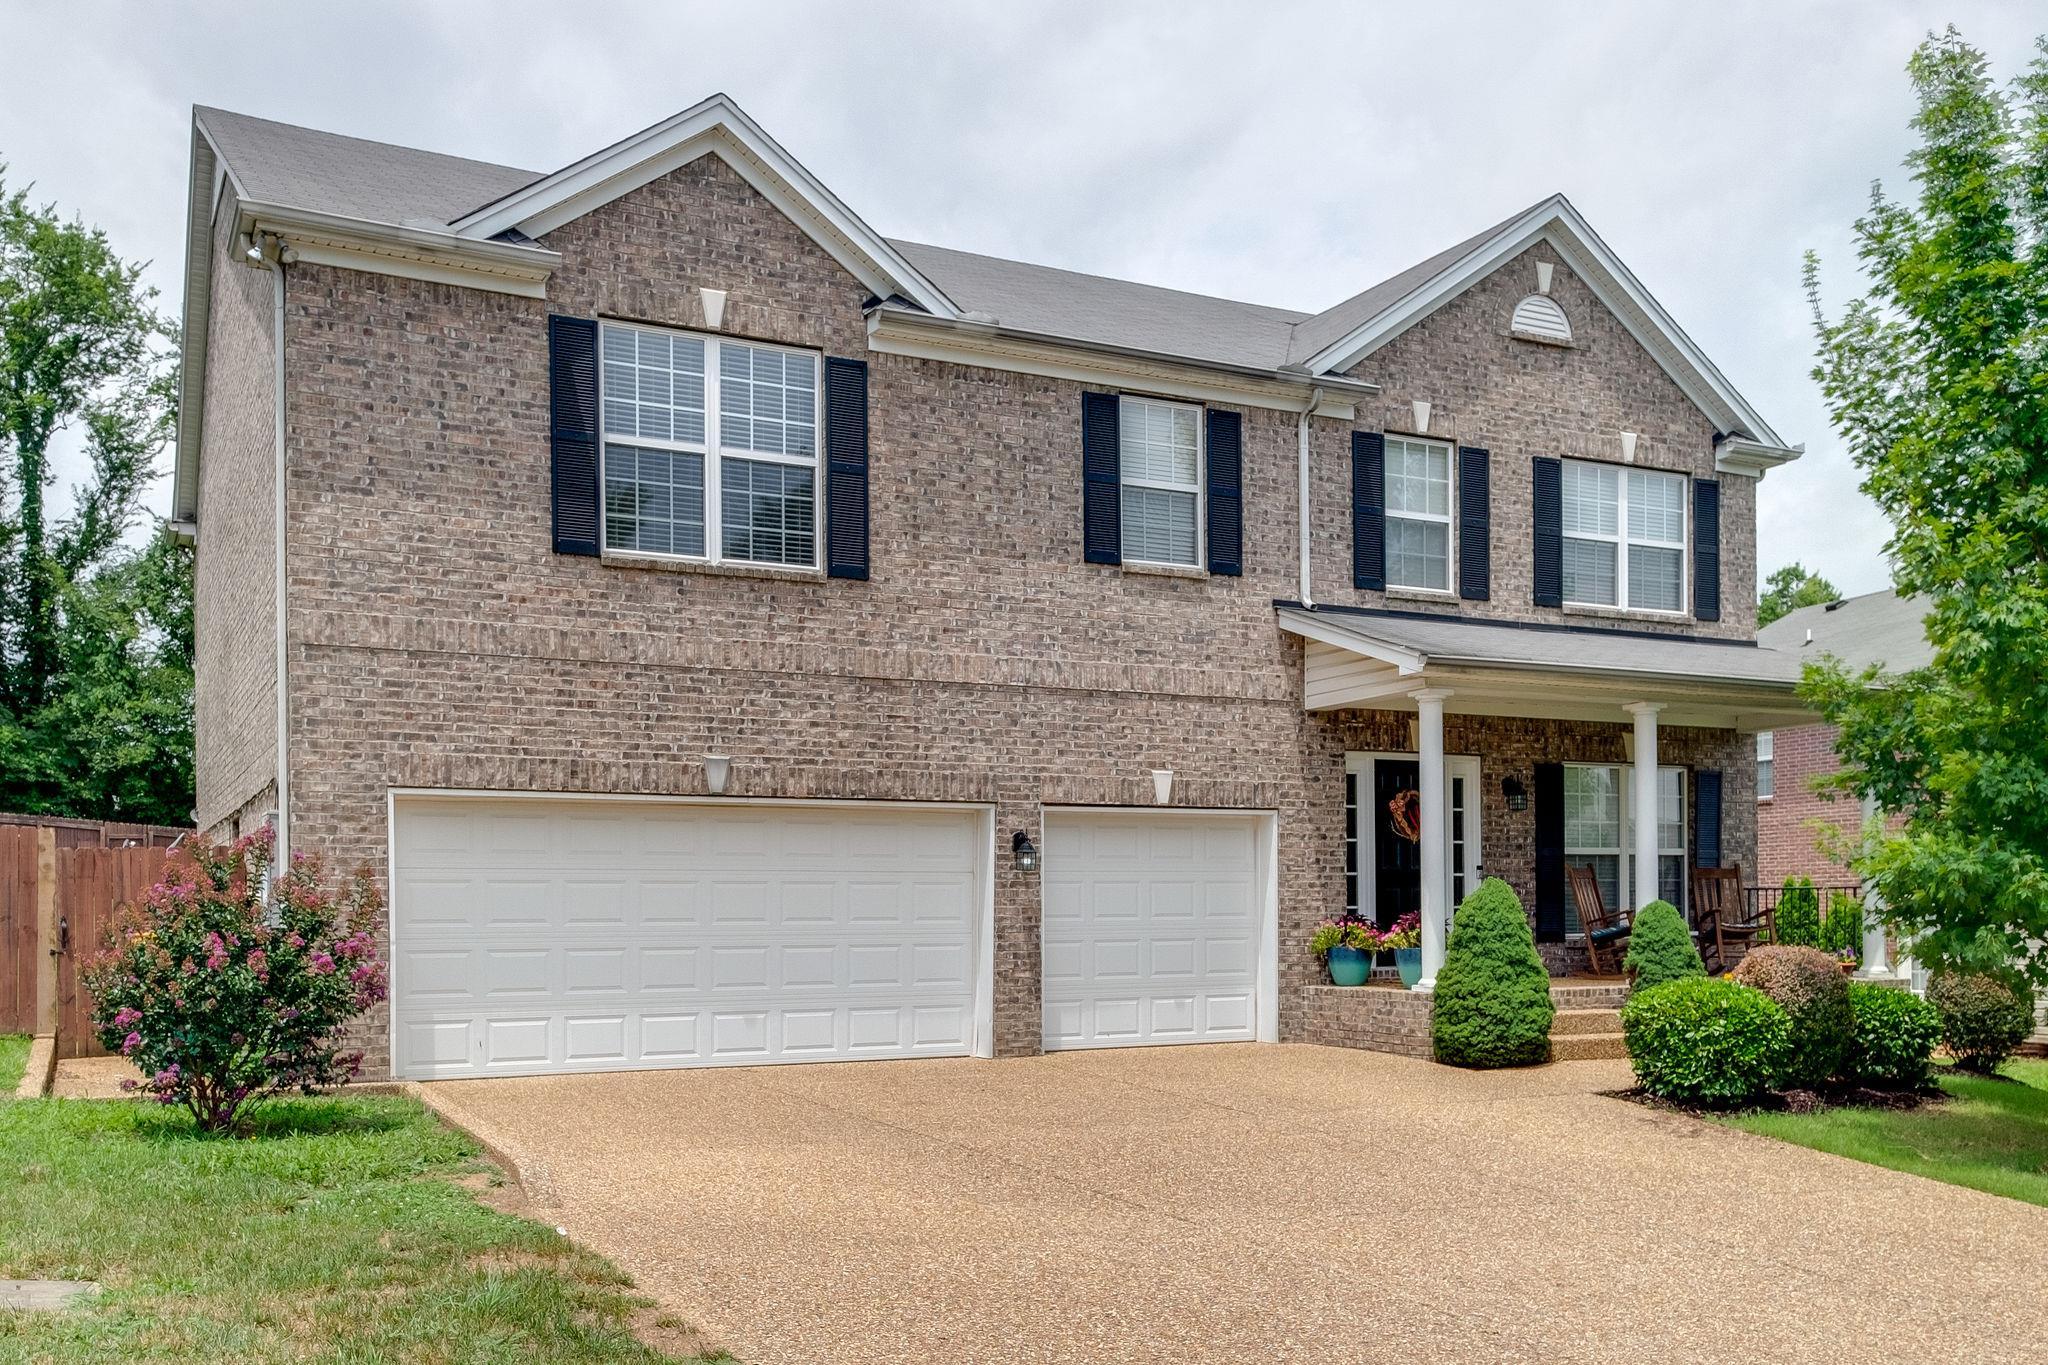 2973 Burtonwood Dr, Spring Hill, TN 37174 - Spring Hill, TN real estate listing